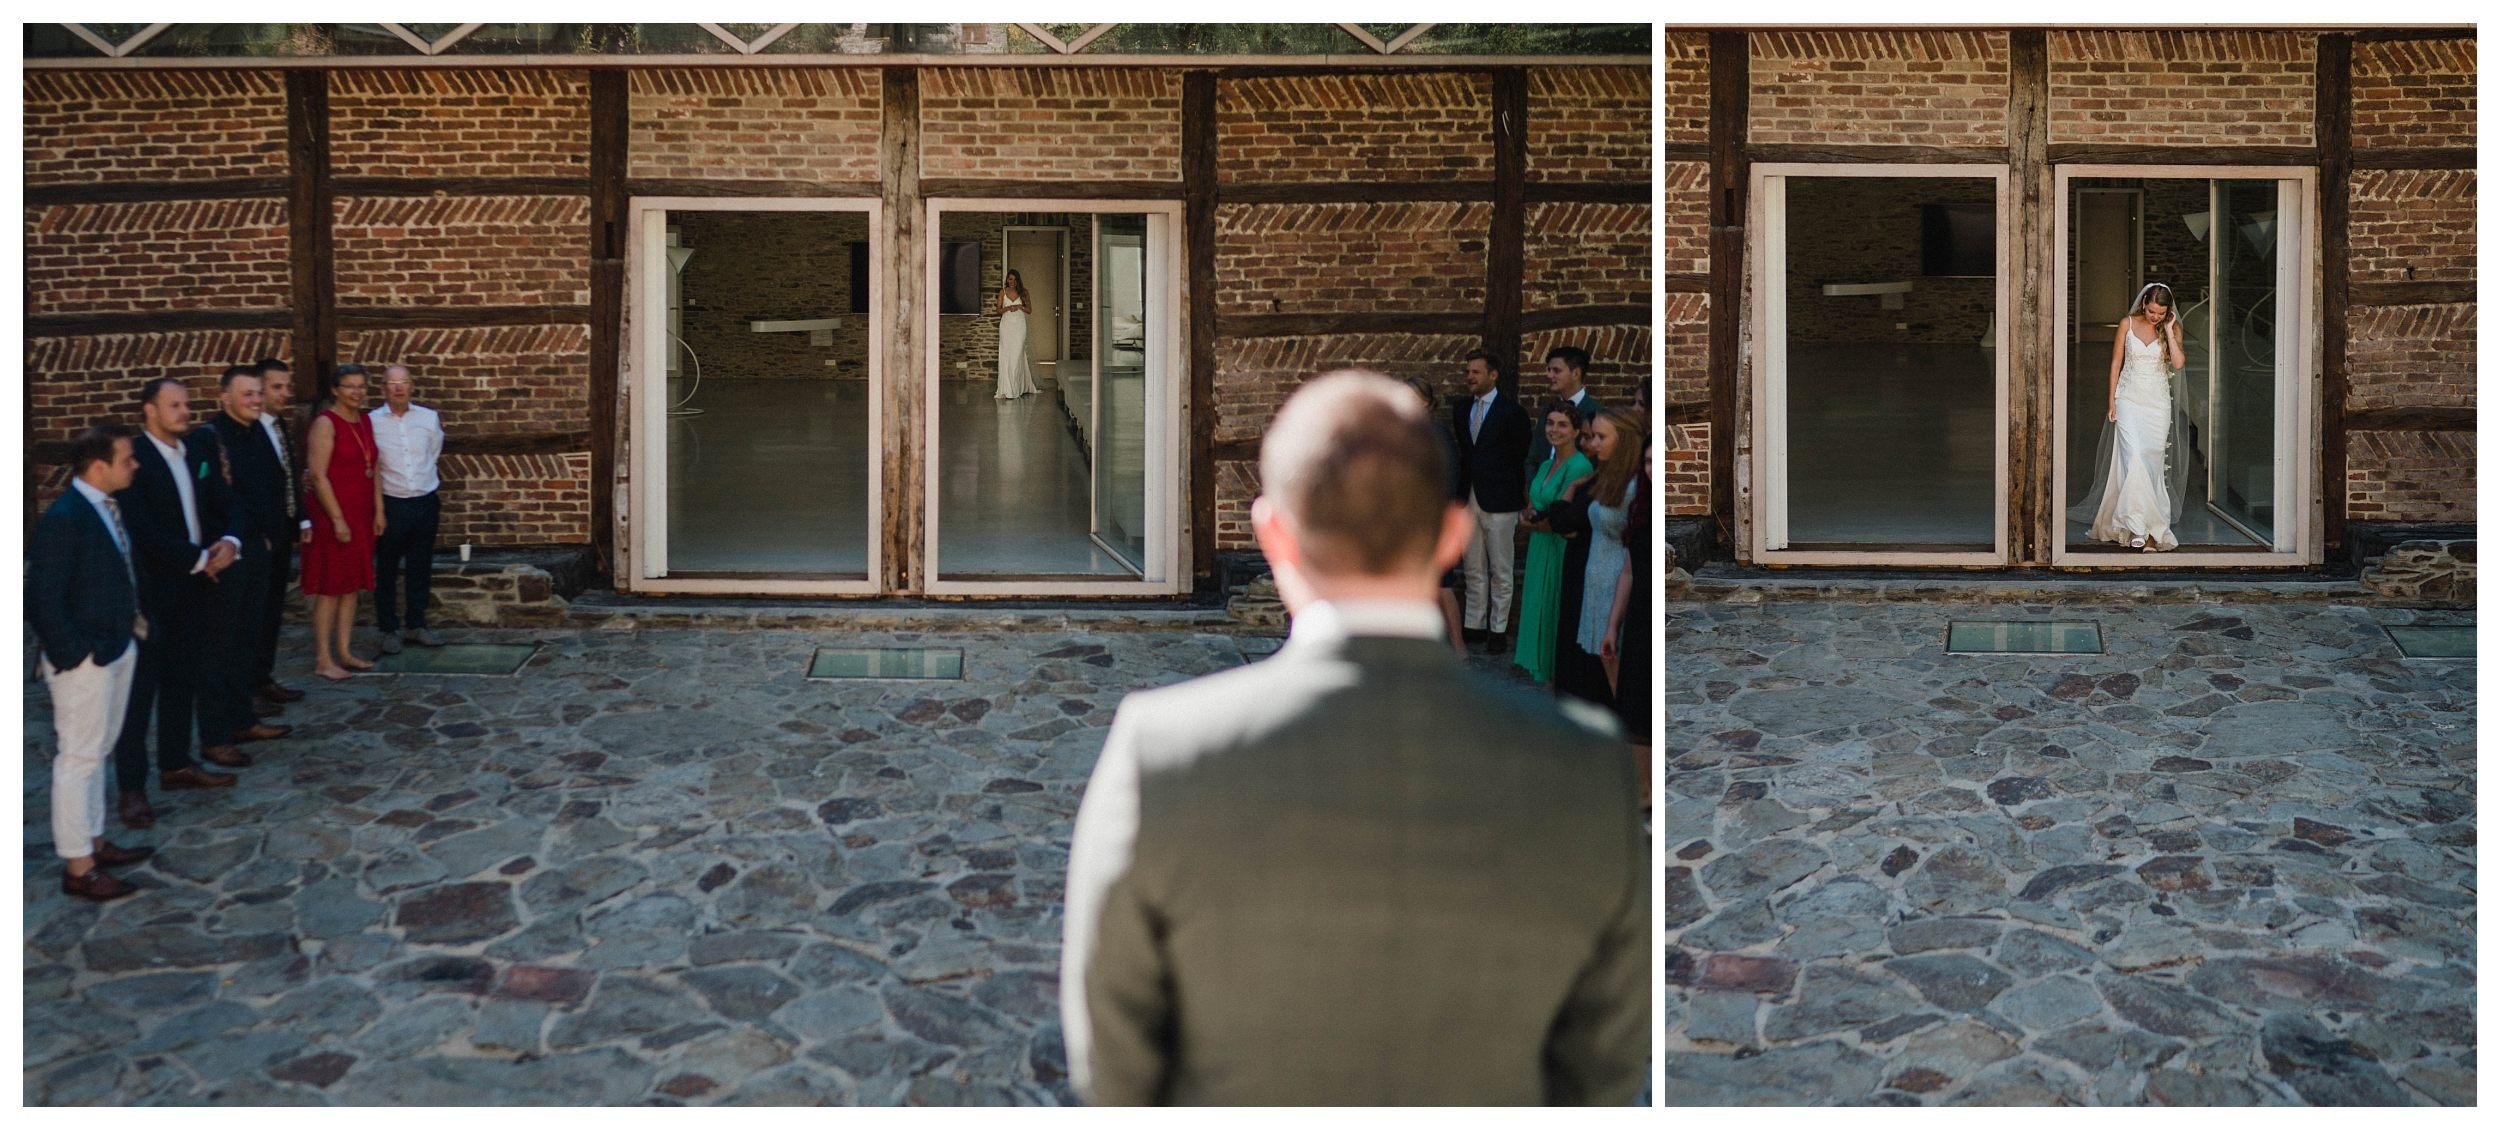 huwelijksfotograaf bruidsfotograaf destinationwedding huwelijksfotografie in ardennen nederland (22).jpg